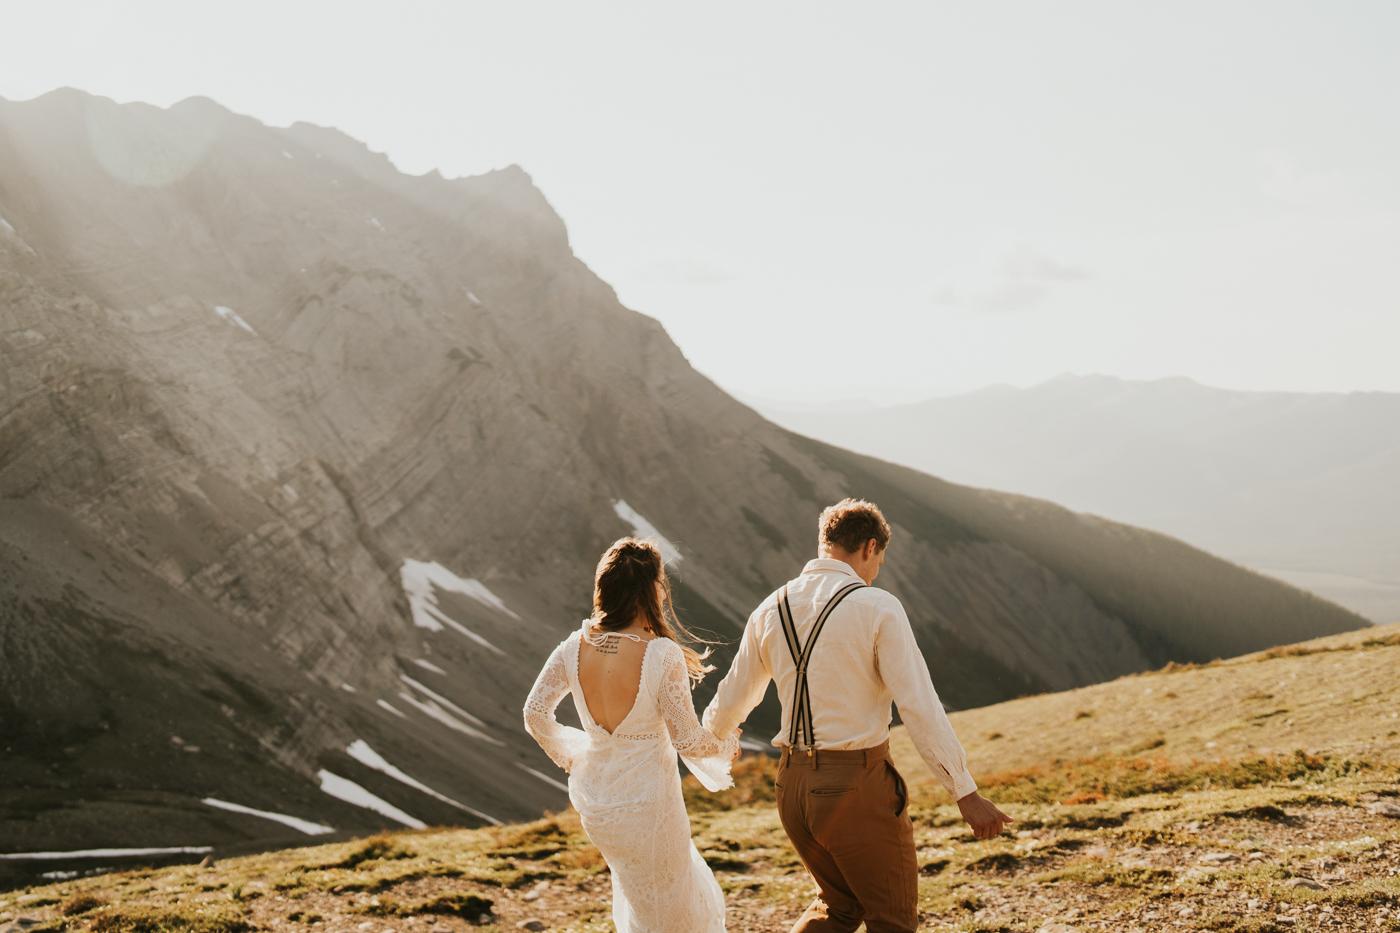 tyraephotography_photographer_wedding_elopement_engagement_photography-08420.jpg